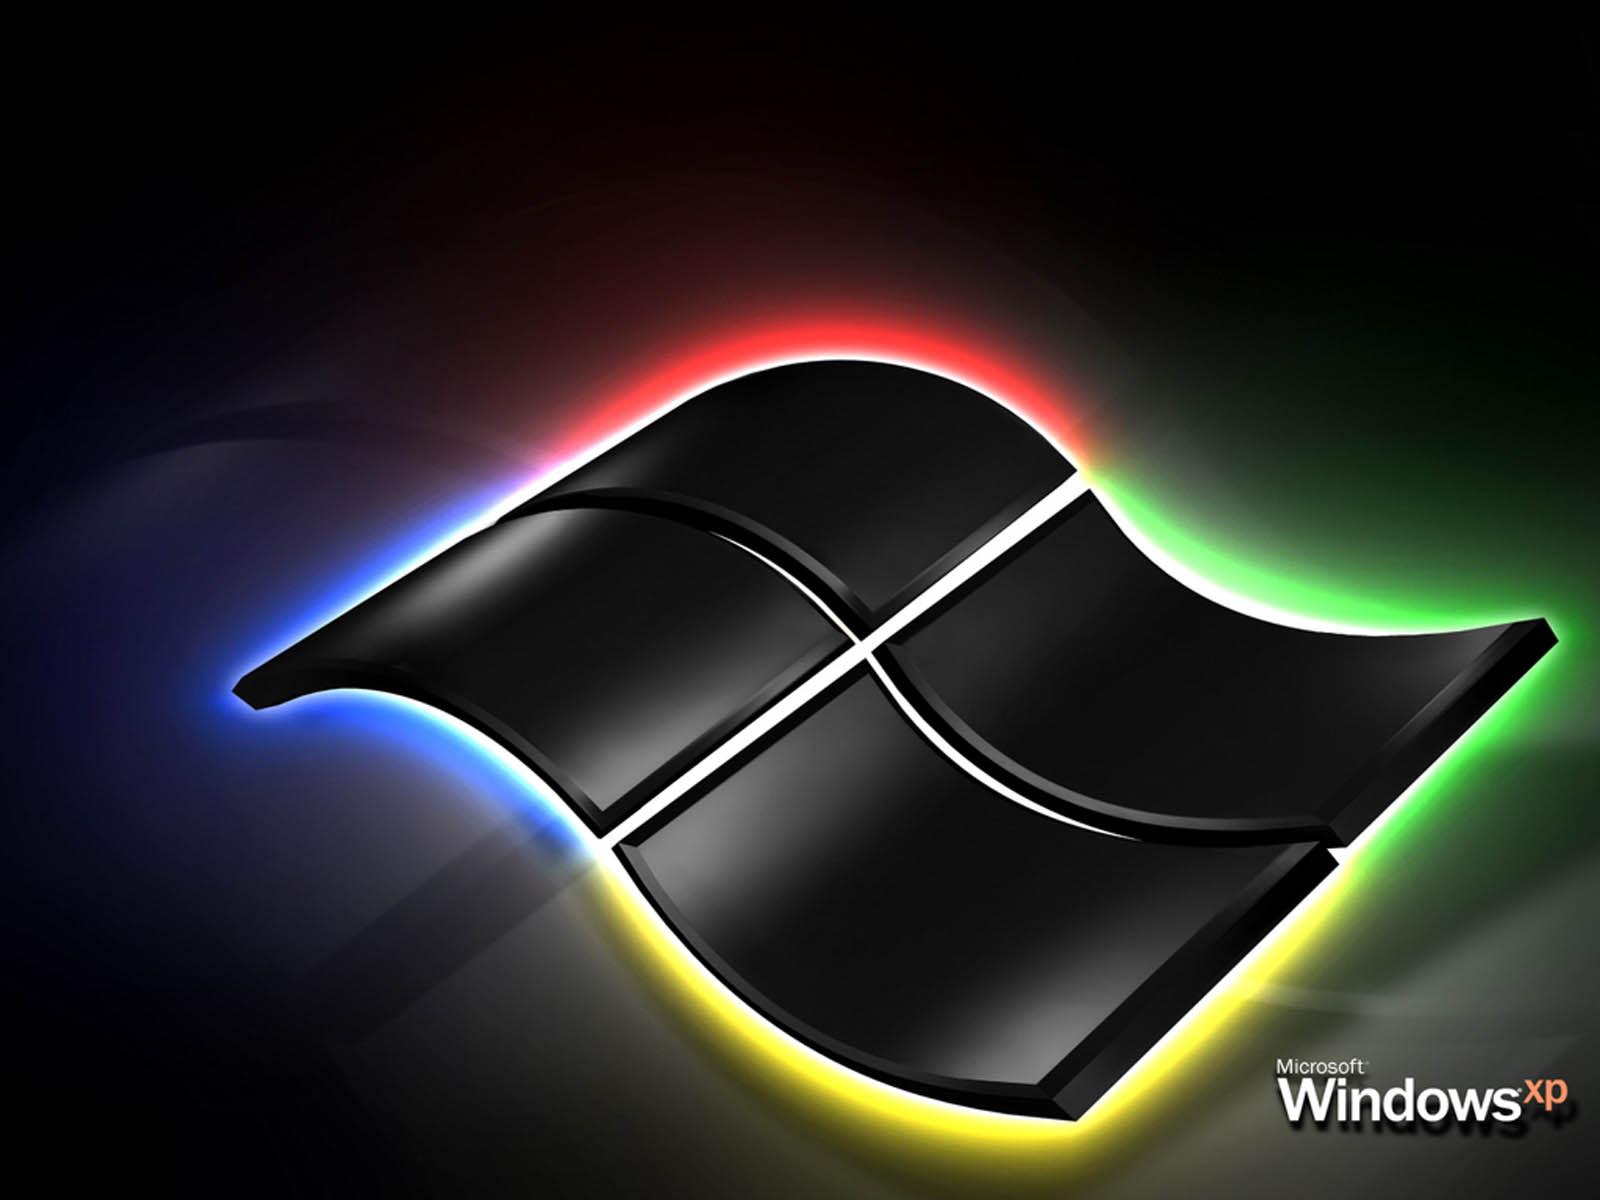 Windows XP Desktop Wallpapers Windows XP Desktop Backgrounds 1600x1200